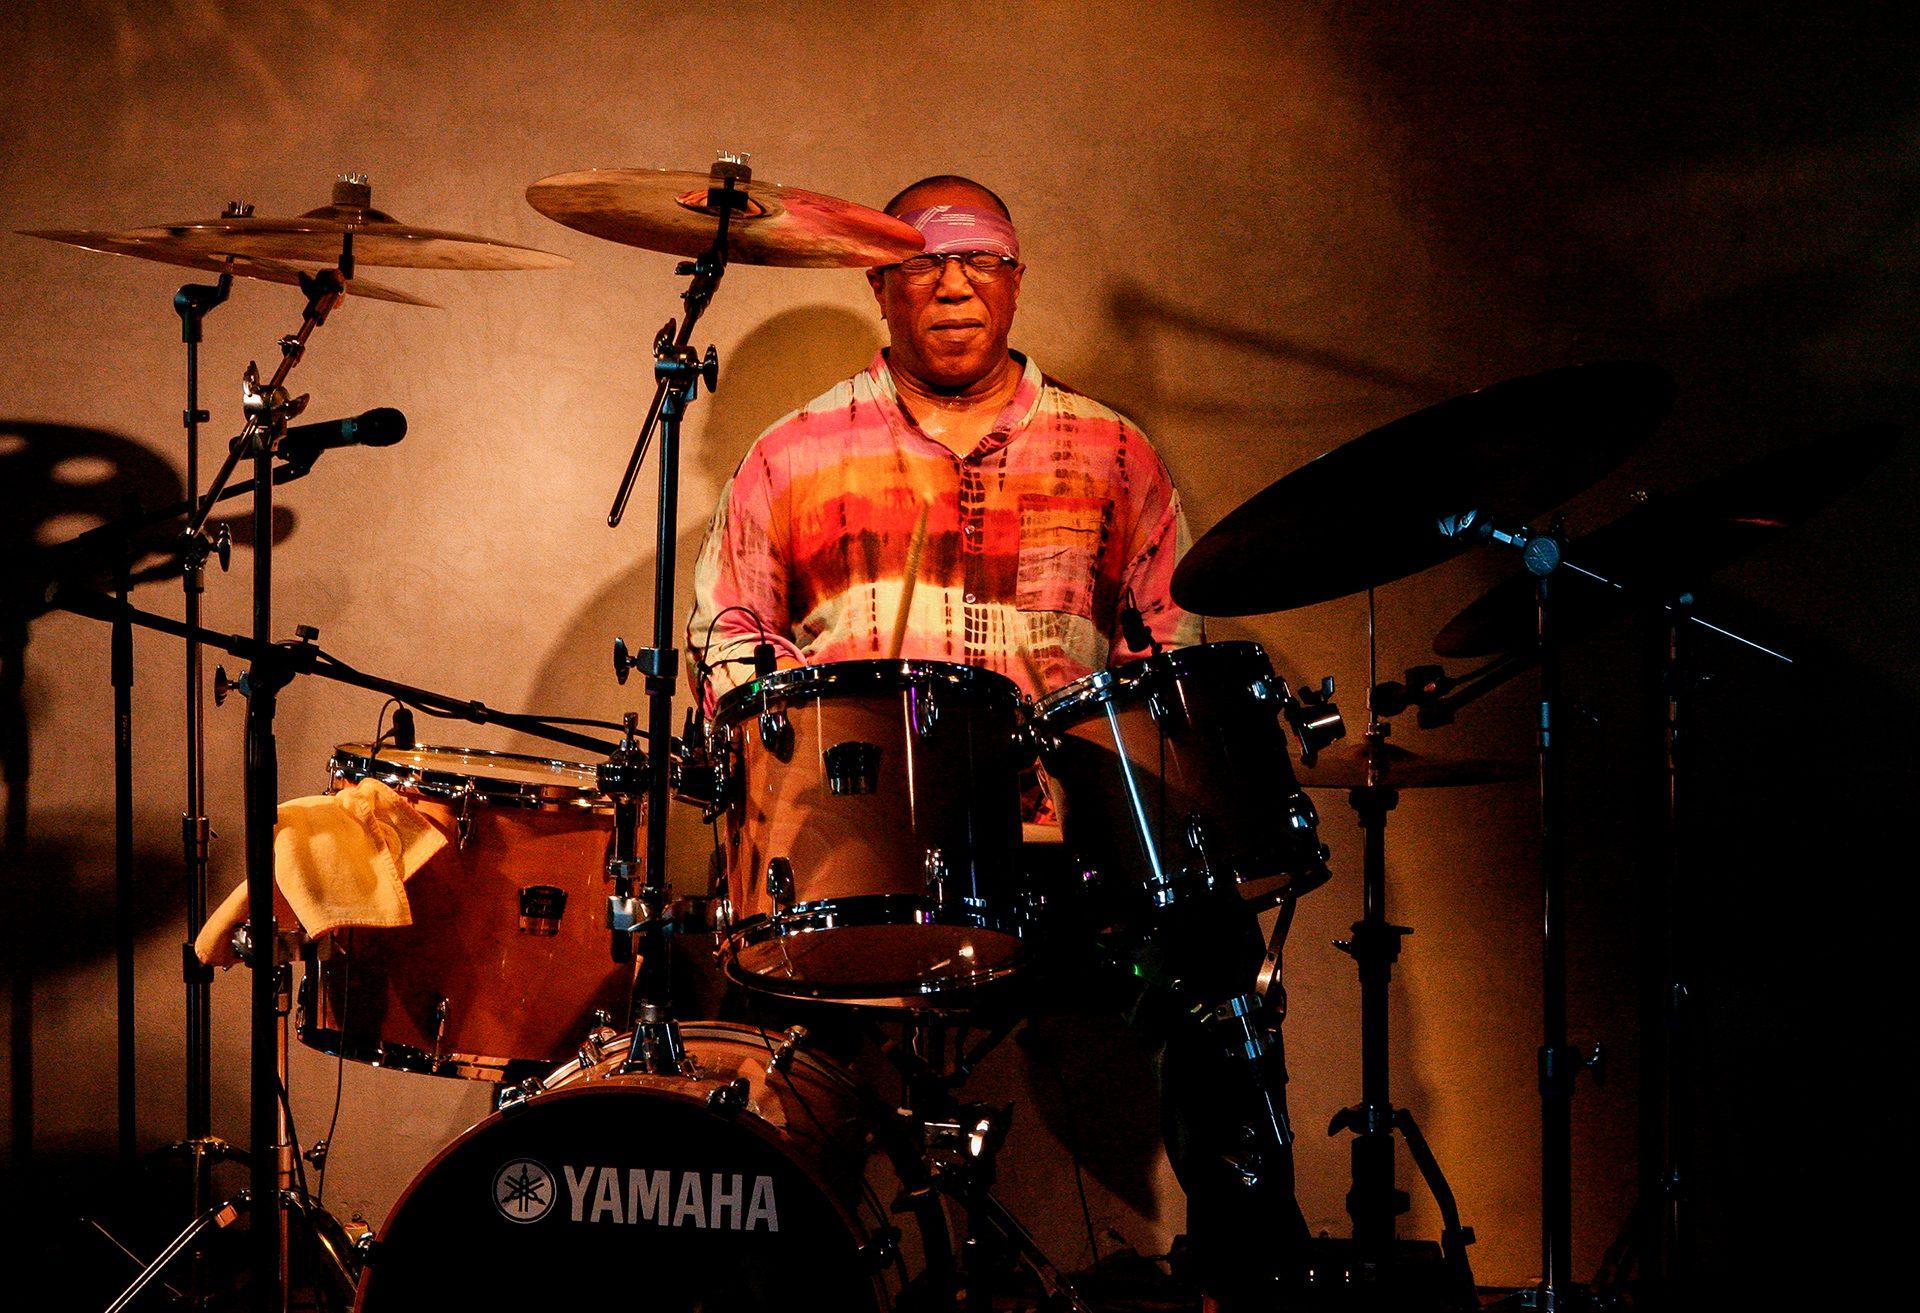 Billy Cobham, drummer, jazz, Miles Davis, Mahavishnu Orchestra, Jack Bruce, New York Jazz Quartet, Jazz Is Dead, Bobby and the Midnites, Mark-Almond, George Duke